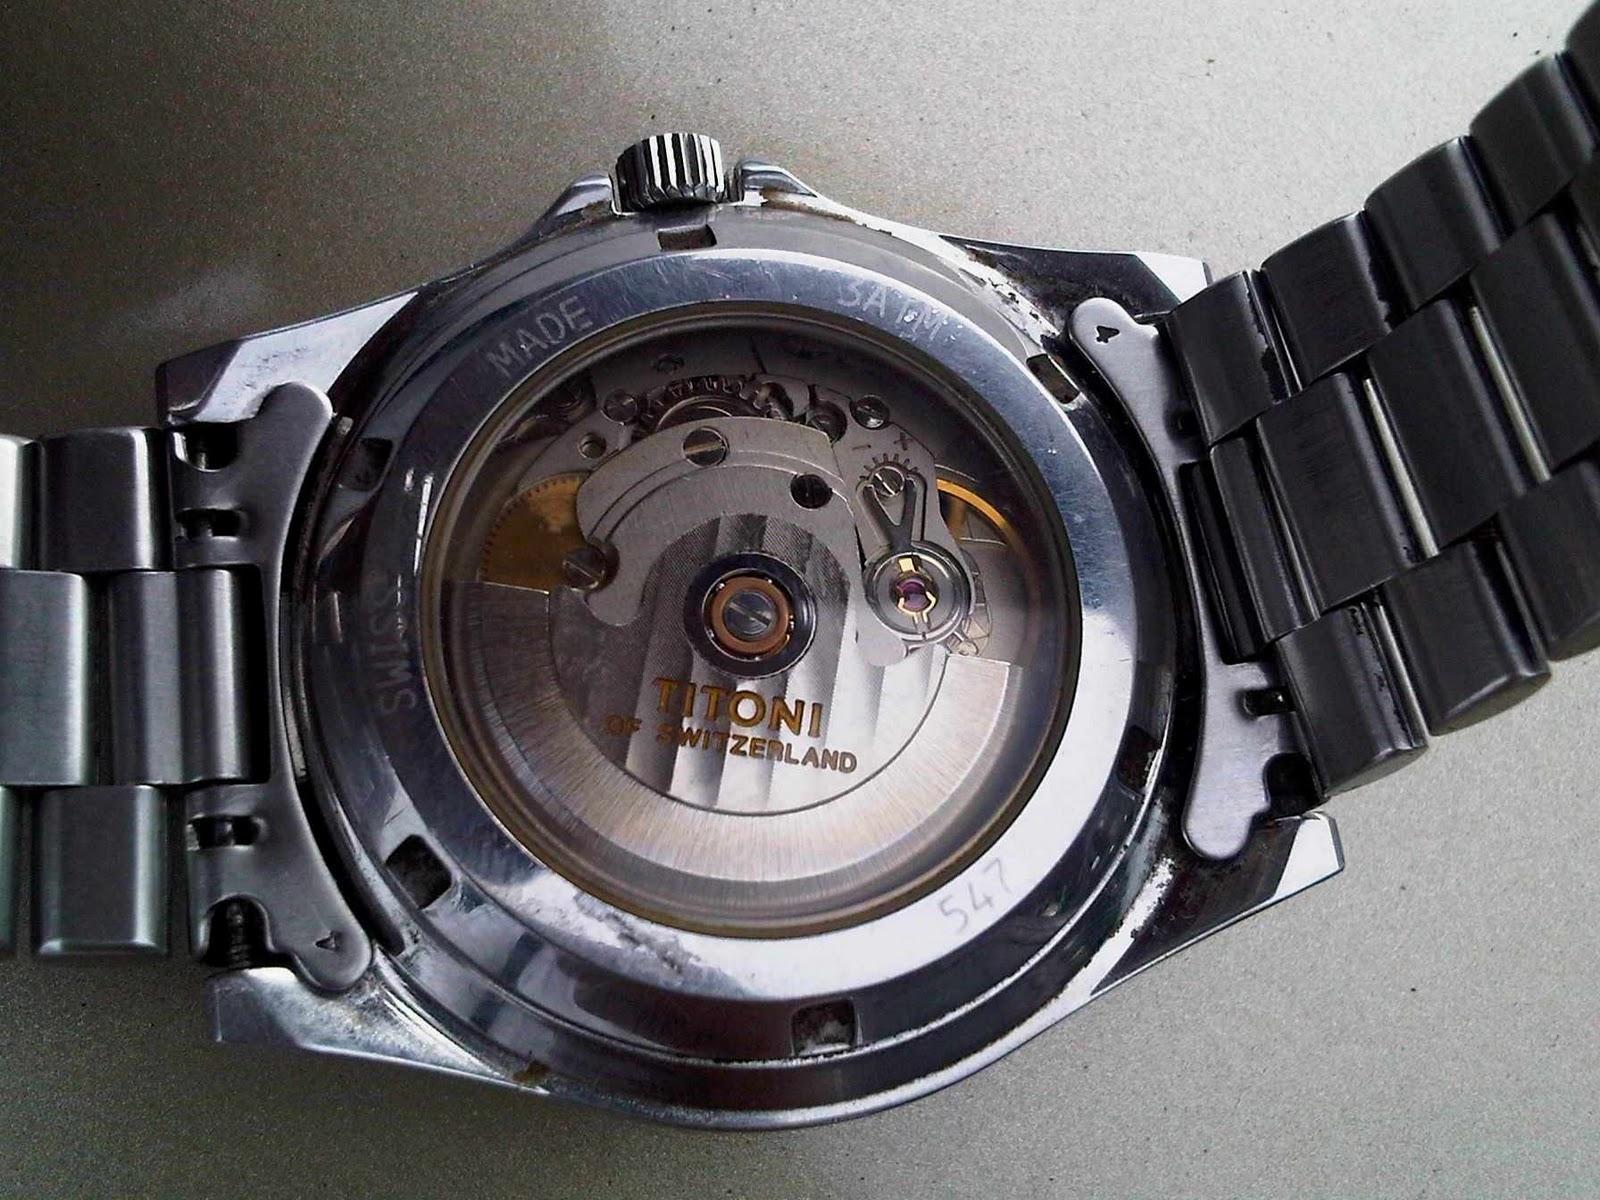 Arloji Doeloe Titoni Automatic Discontinued 547 Sy 038 Sold Rolex Gmt Kombinasi Swiss Mesin 2838 2 Sebelumnya Initergolong Discontinue Product Atau Kata Lain Tidak Di Produksi Lagiarloji Ini Memakai Movement Eta Cal 2824 225